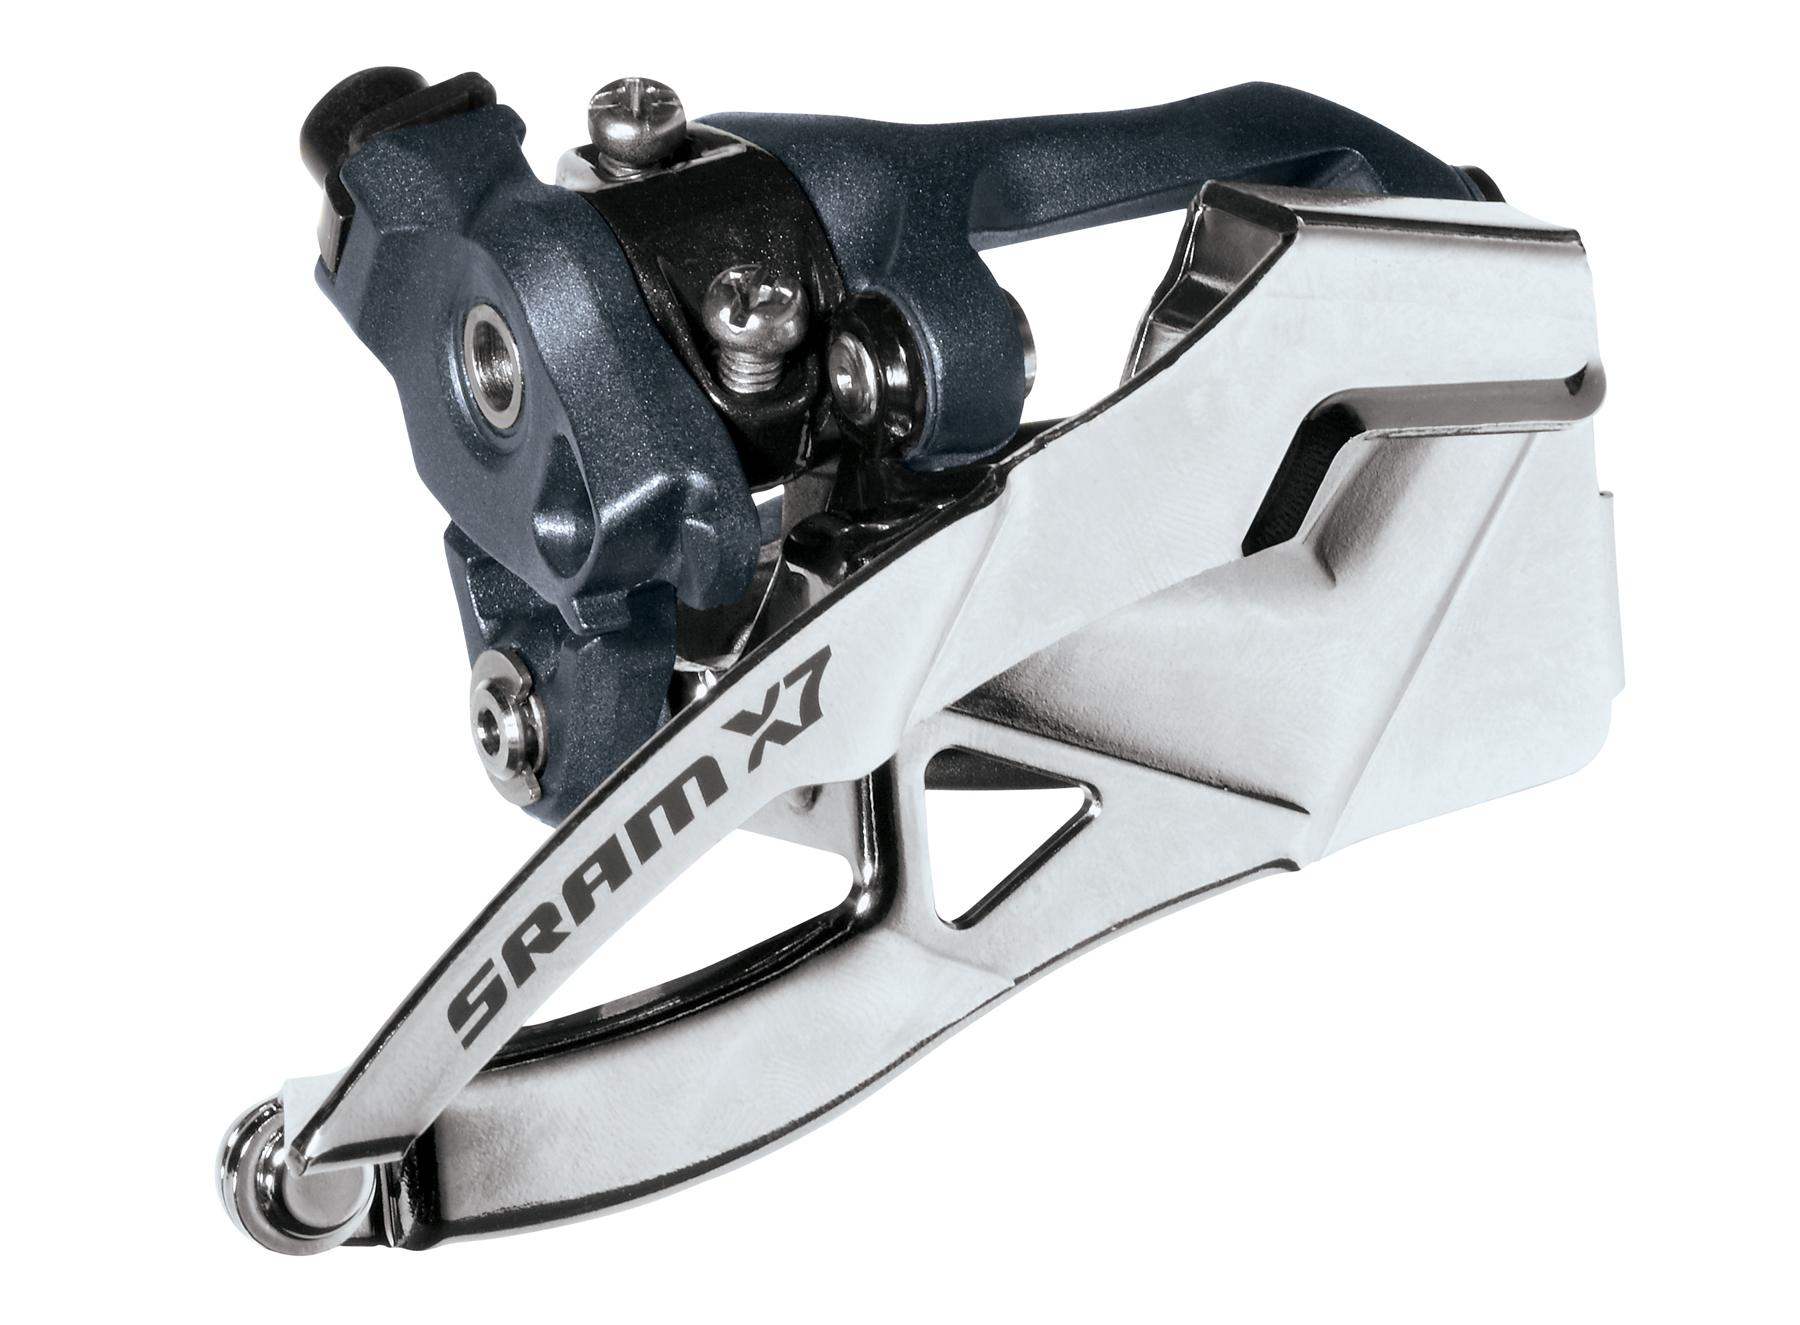 SRAM Front derailleur X7 Low clamp Ø31,8/34,9 mm 2x10 speed Dual pull | Front derailleur